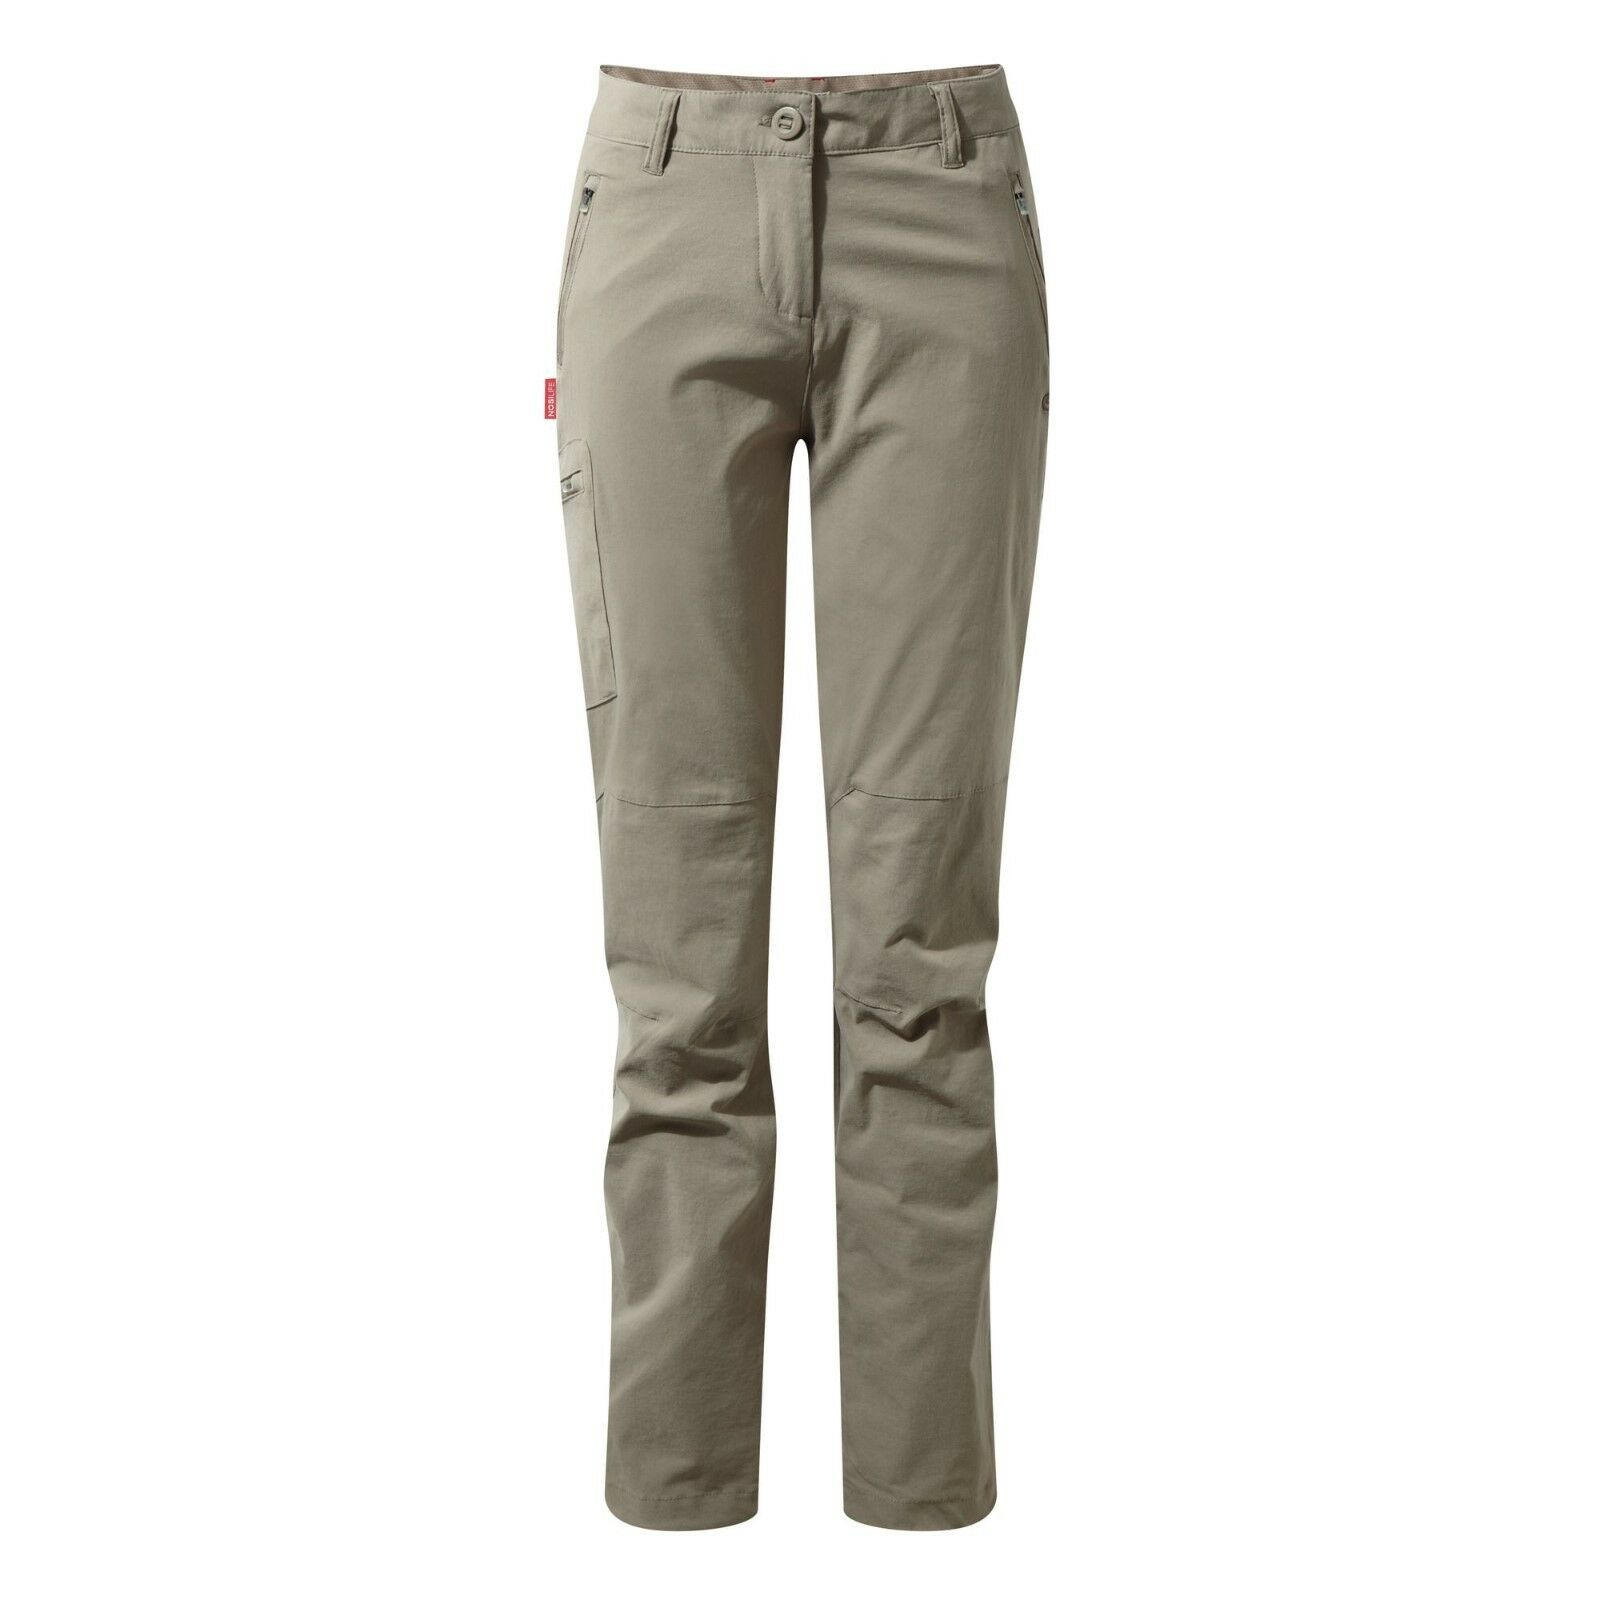 Craghoppers Women's Nosilife Pro Walking Trousers (Reg Leg) - Mushroom